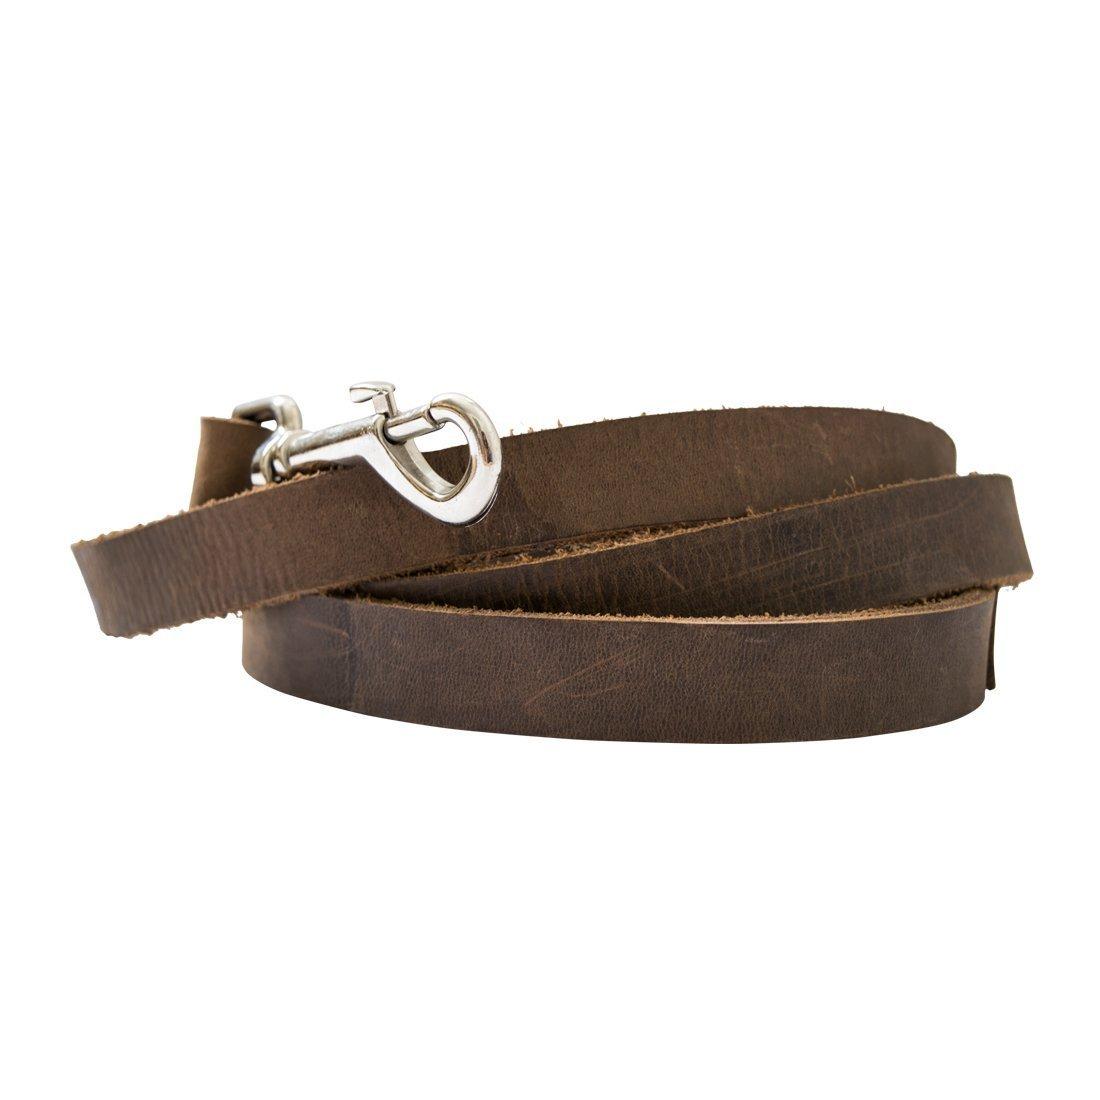 Hide & Drink Tough Leather Dog Leash (6 feet) Handmade Bourbon Brown